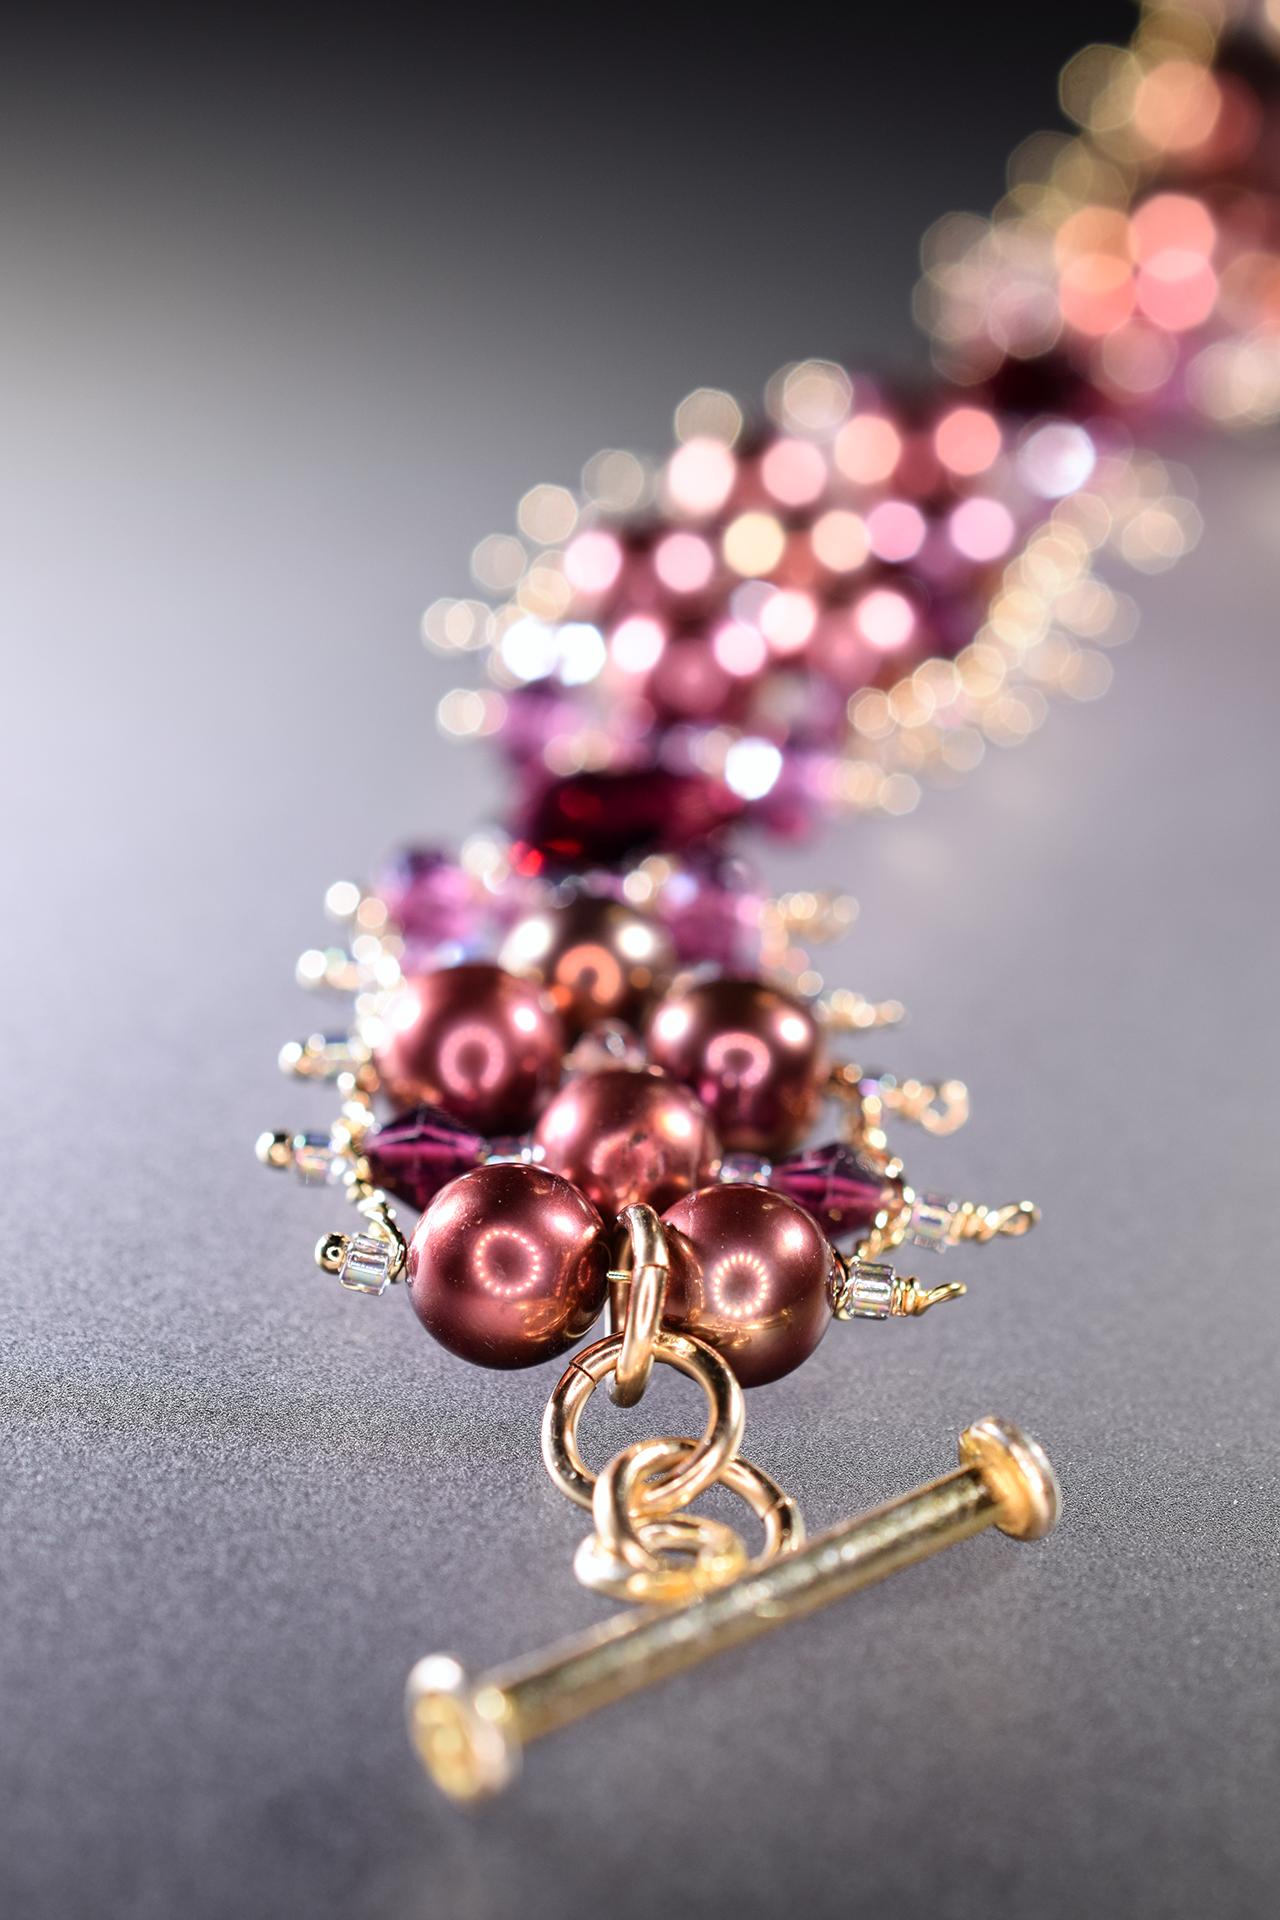 garnet and pearl cuff bracelet